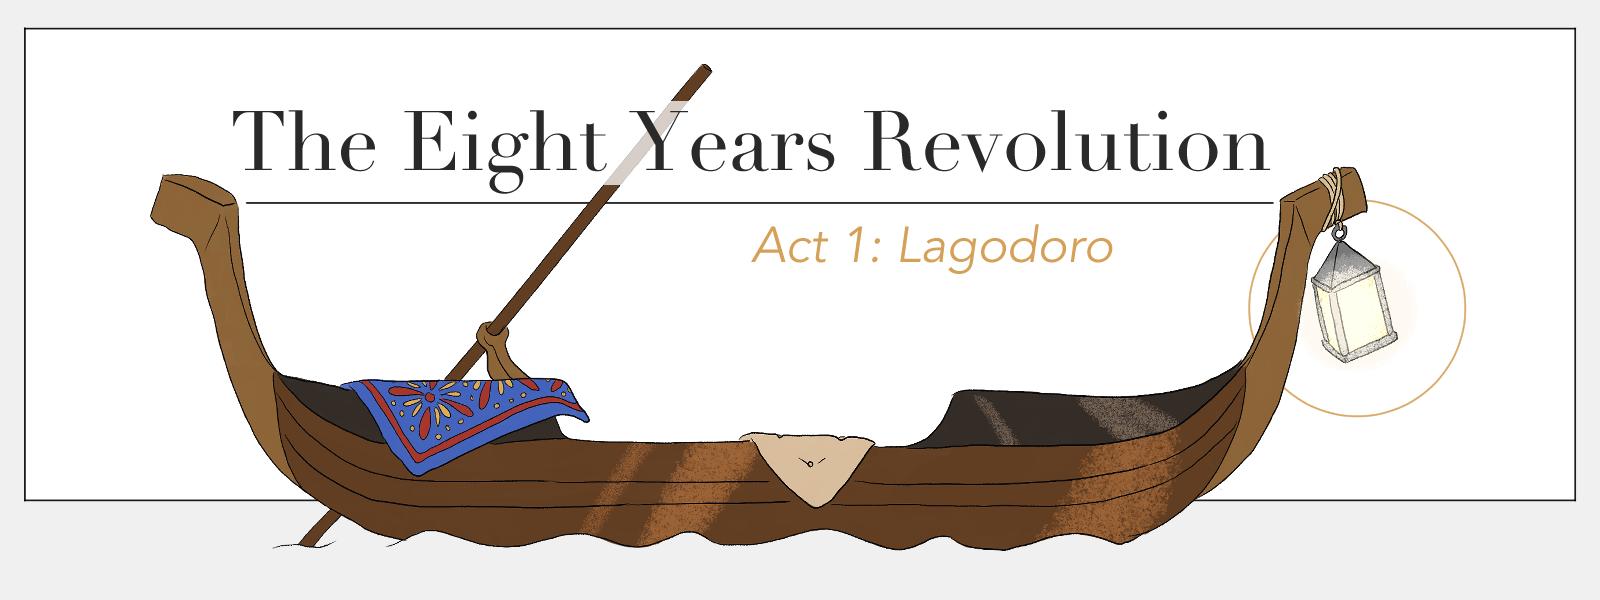 The Eight Years Revolution